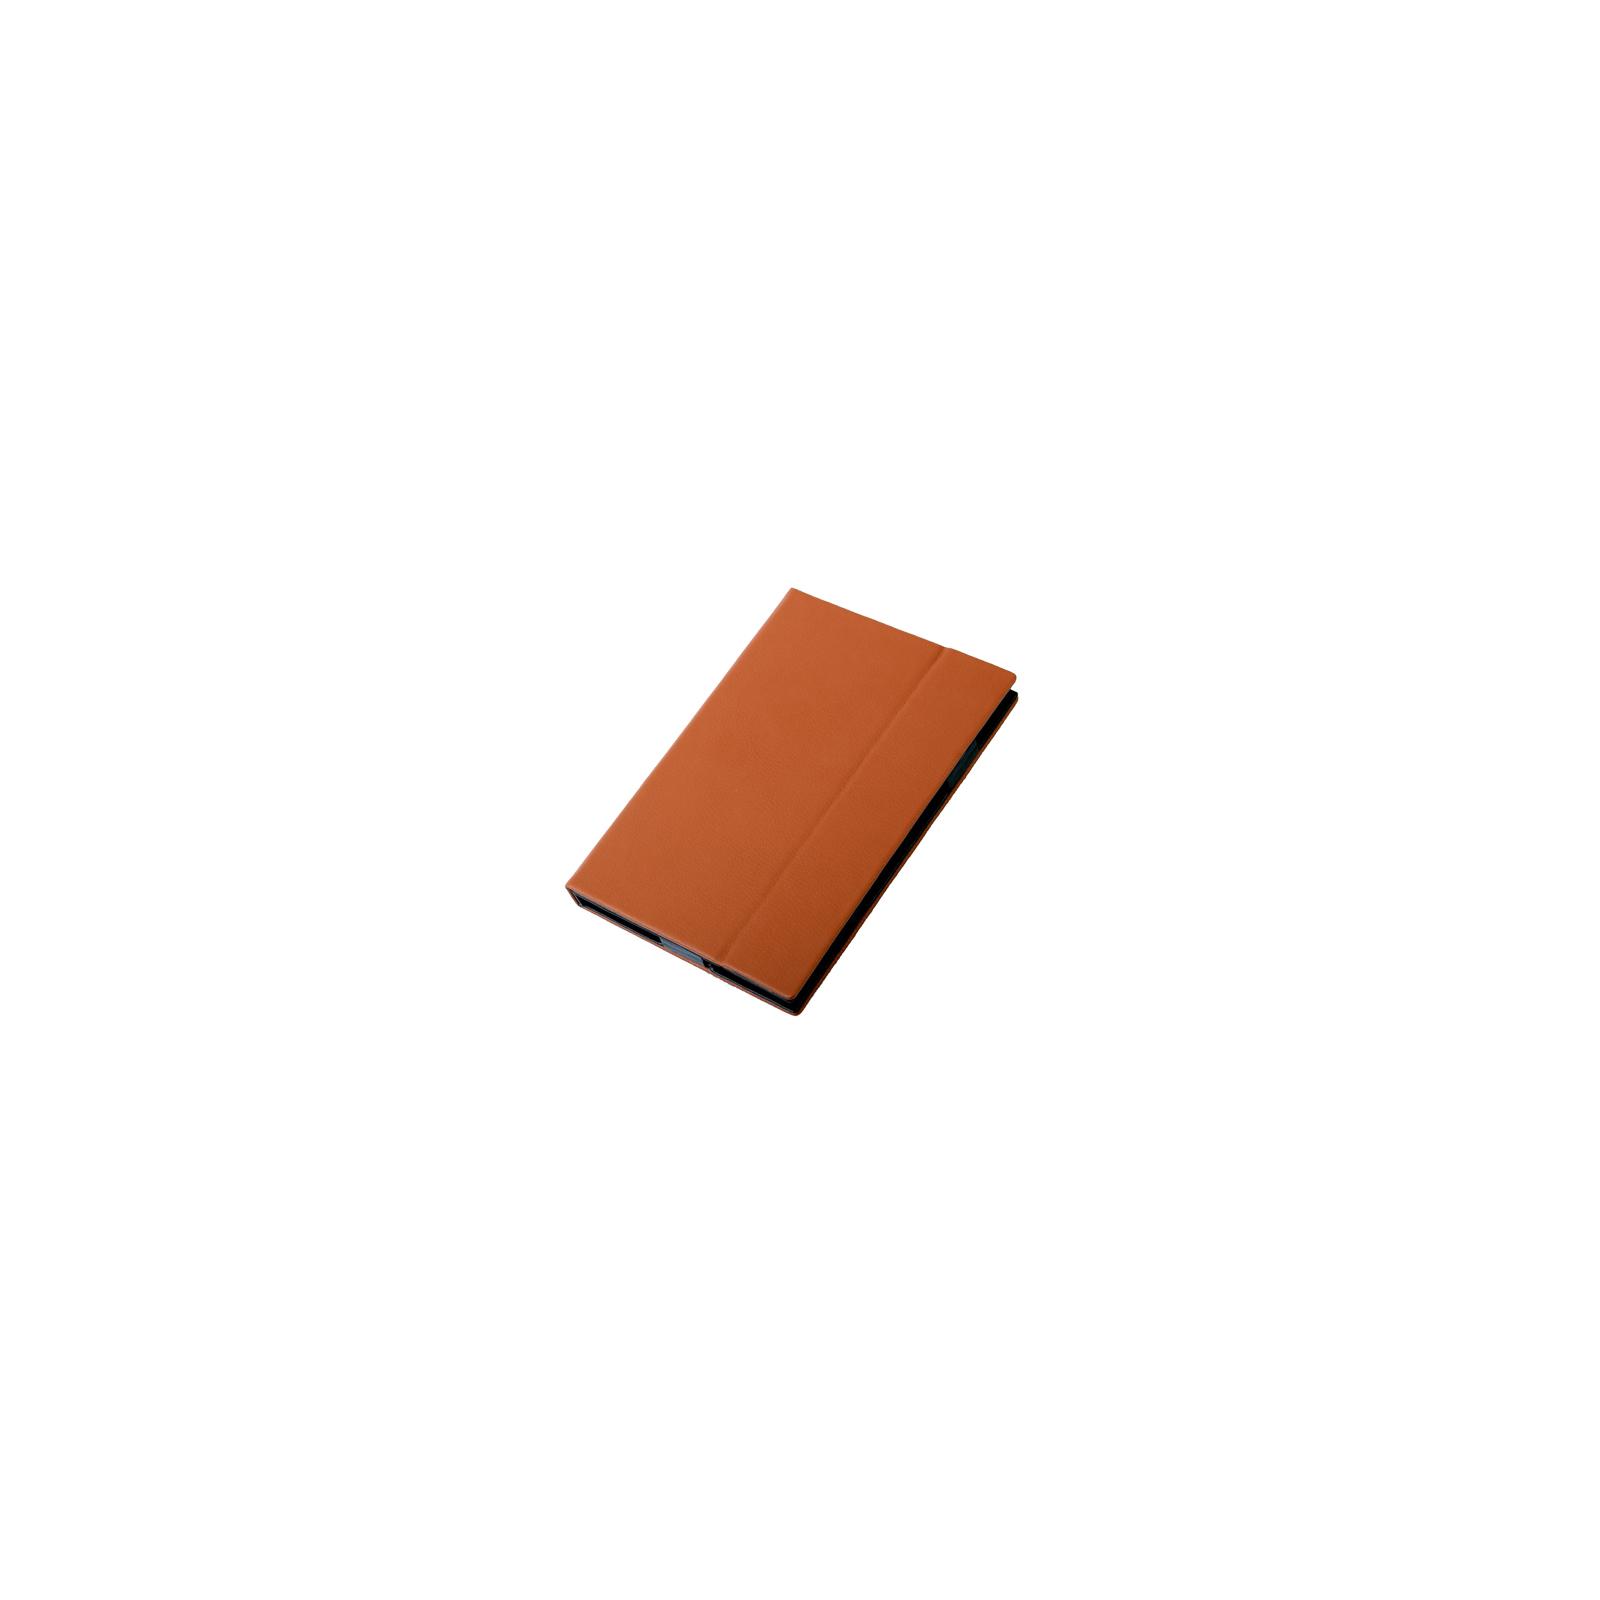 Чехол для планшета Vento 10.1 Desire Matt - brown